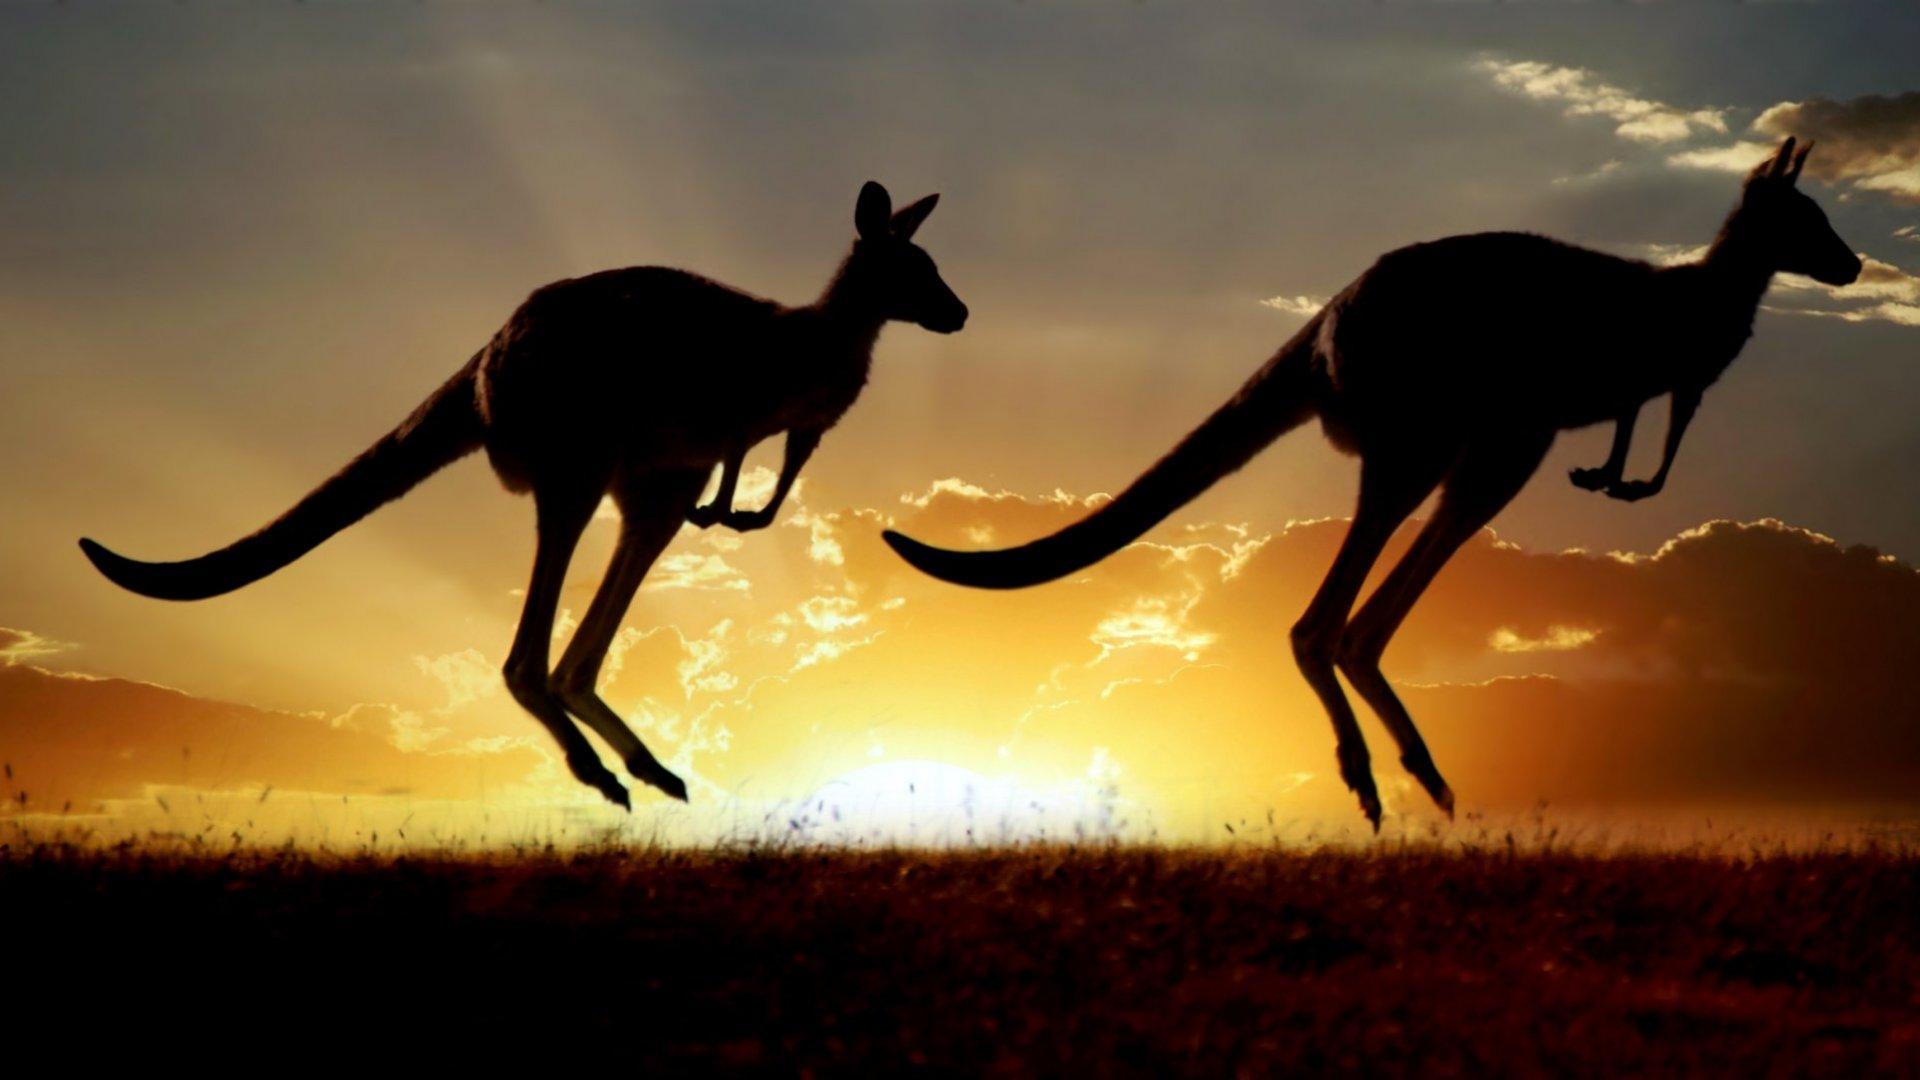 5 Reasons Australia Is Becoming an Innovation Hub